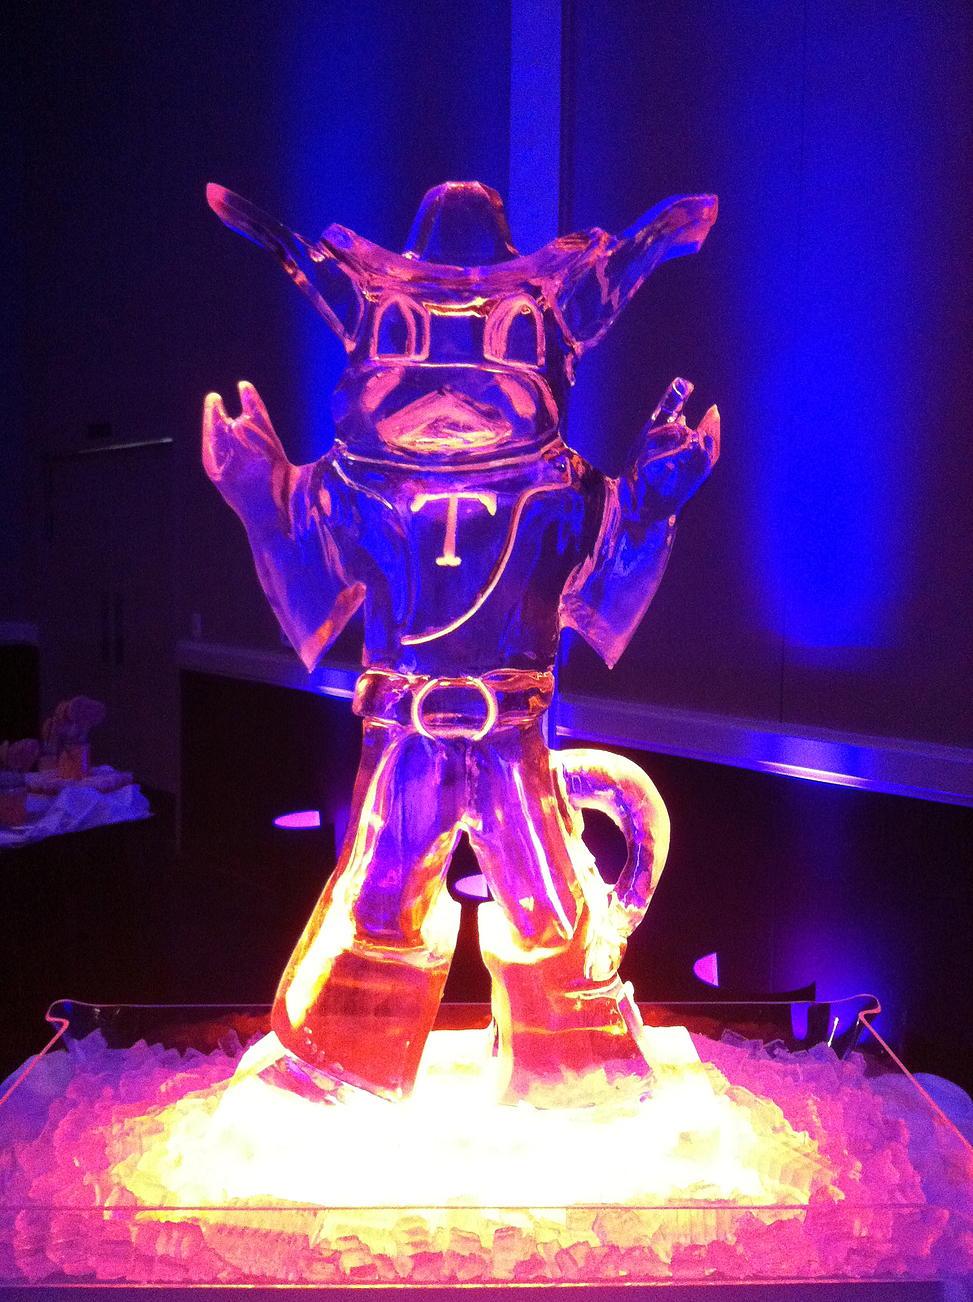 Bevo mascot ice sculpture